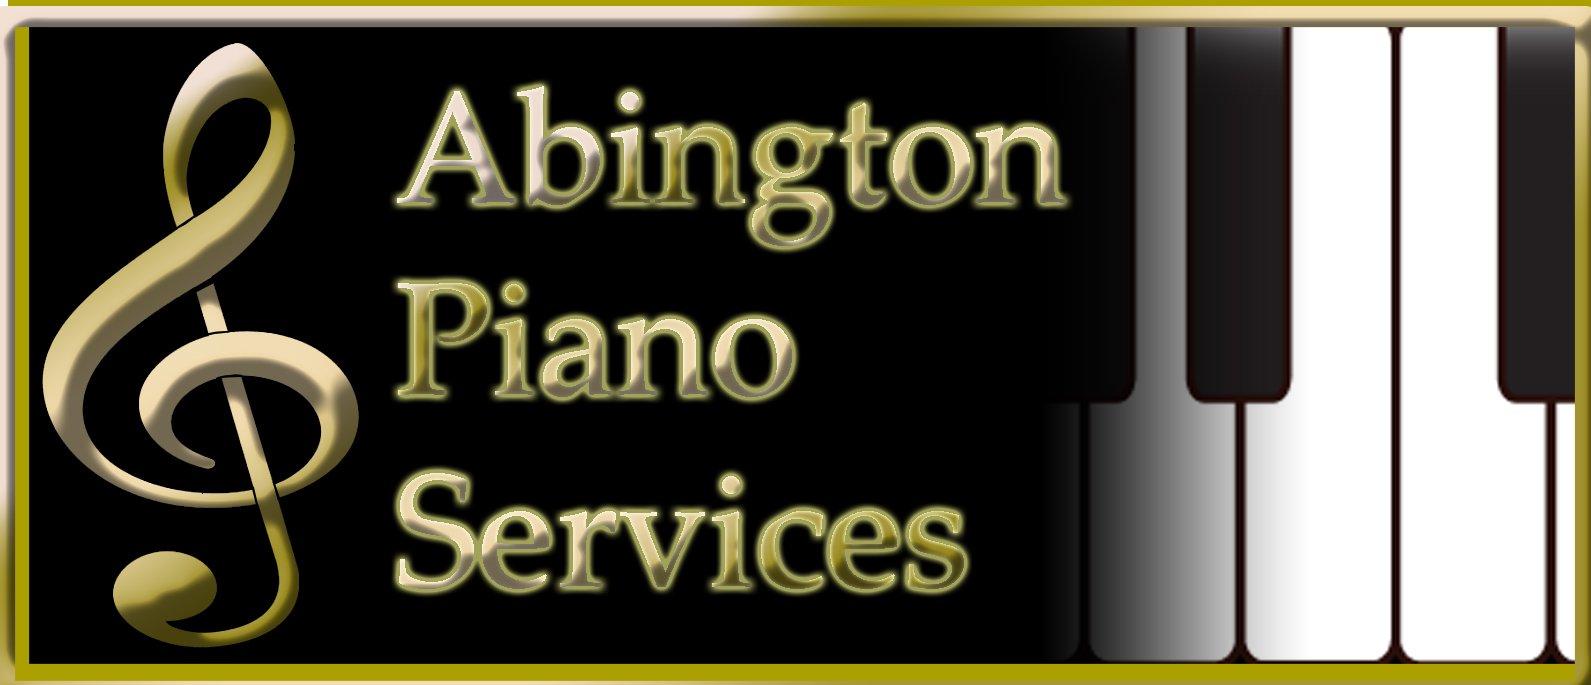 Piano Tuning Wellingborough